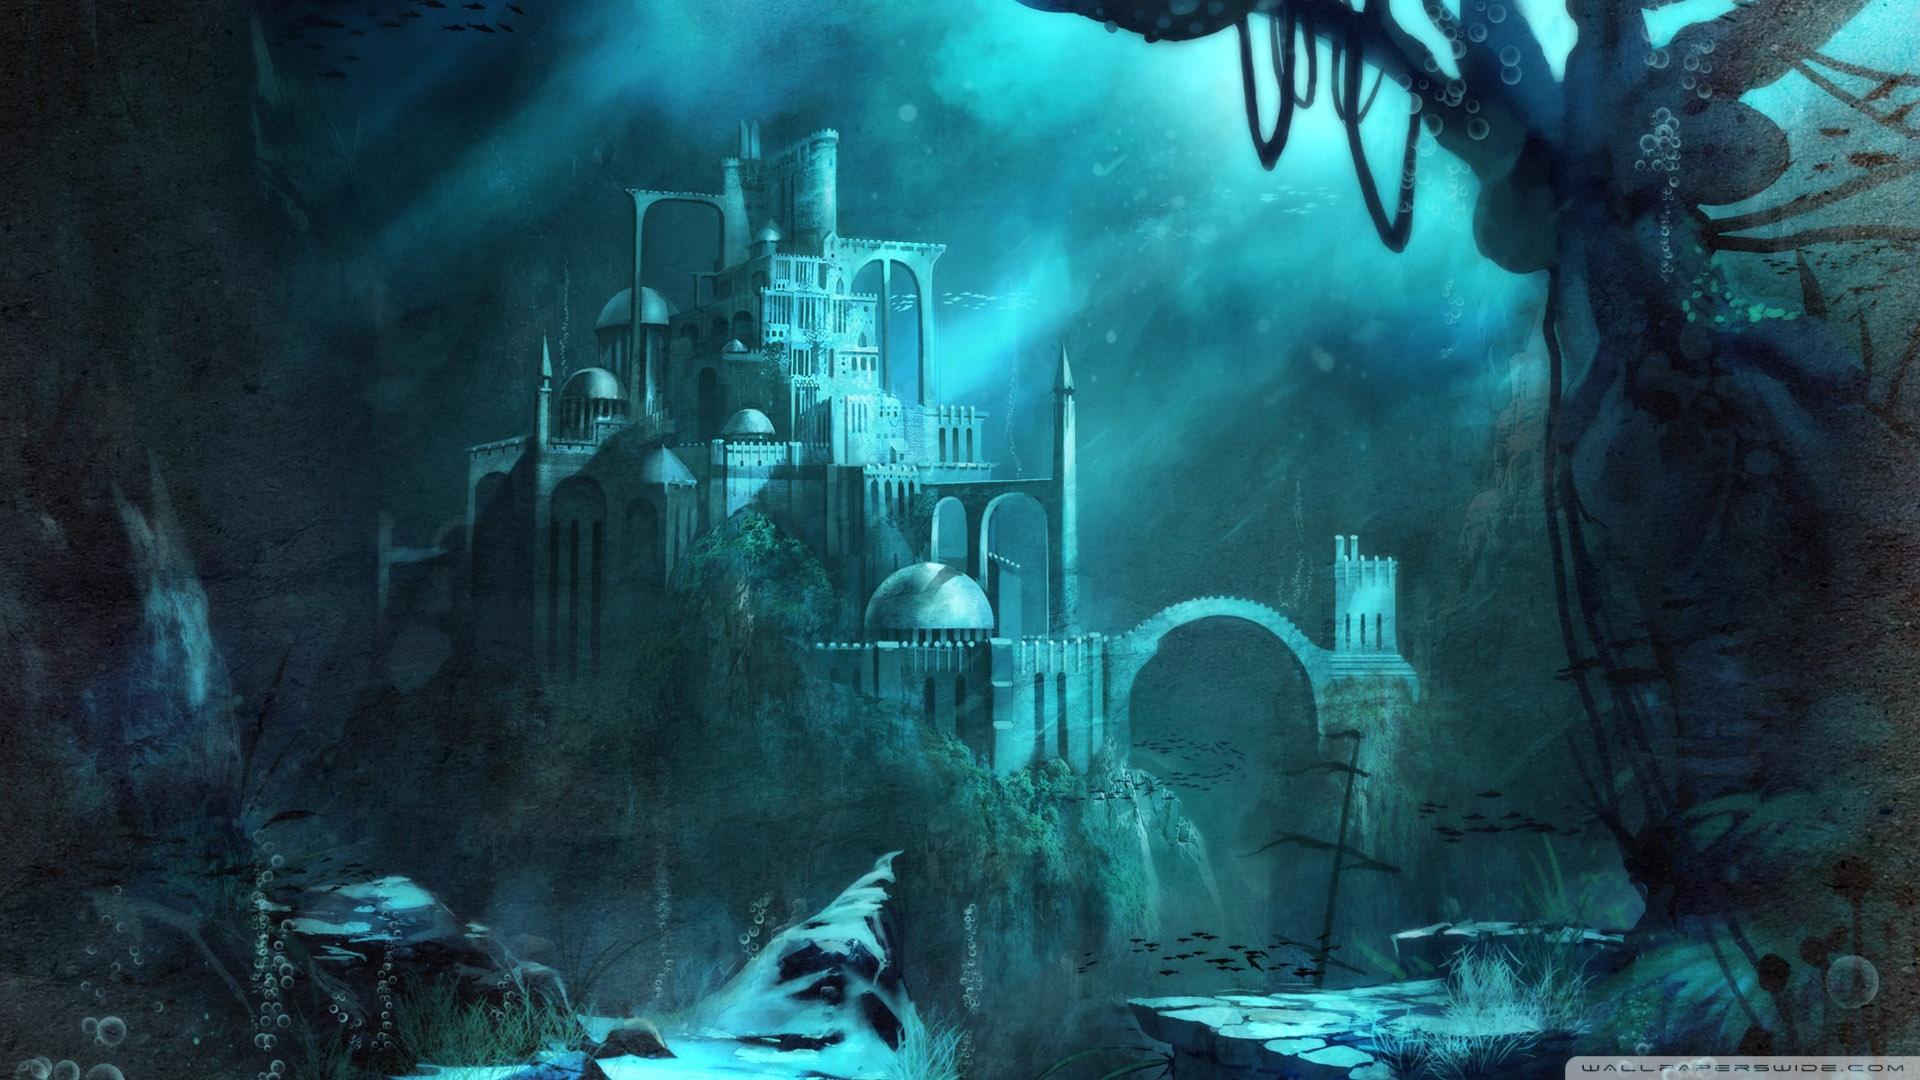 Alpha coders wallpaper abyss fantasy ocean 201539